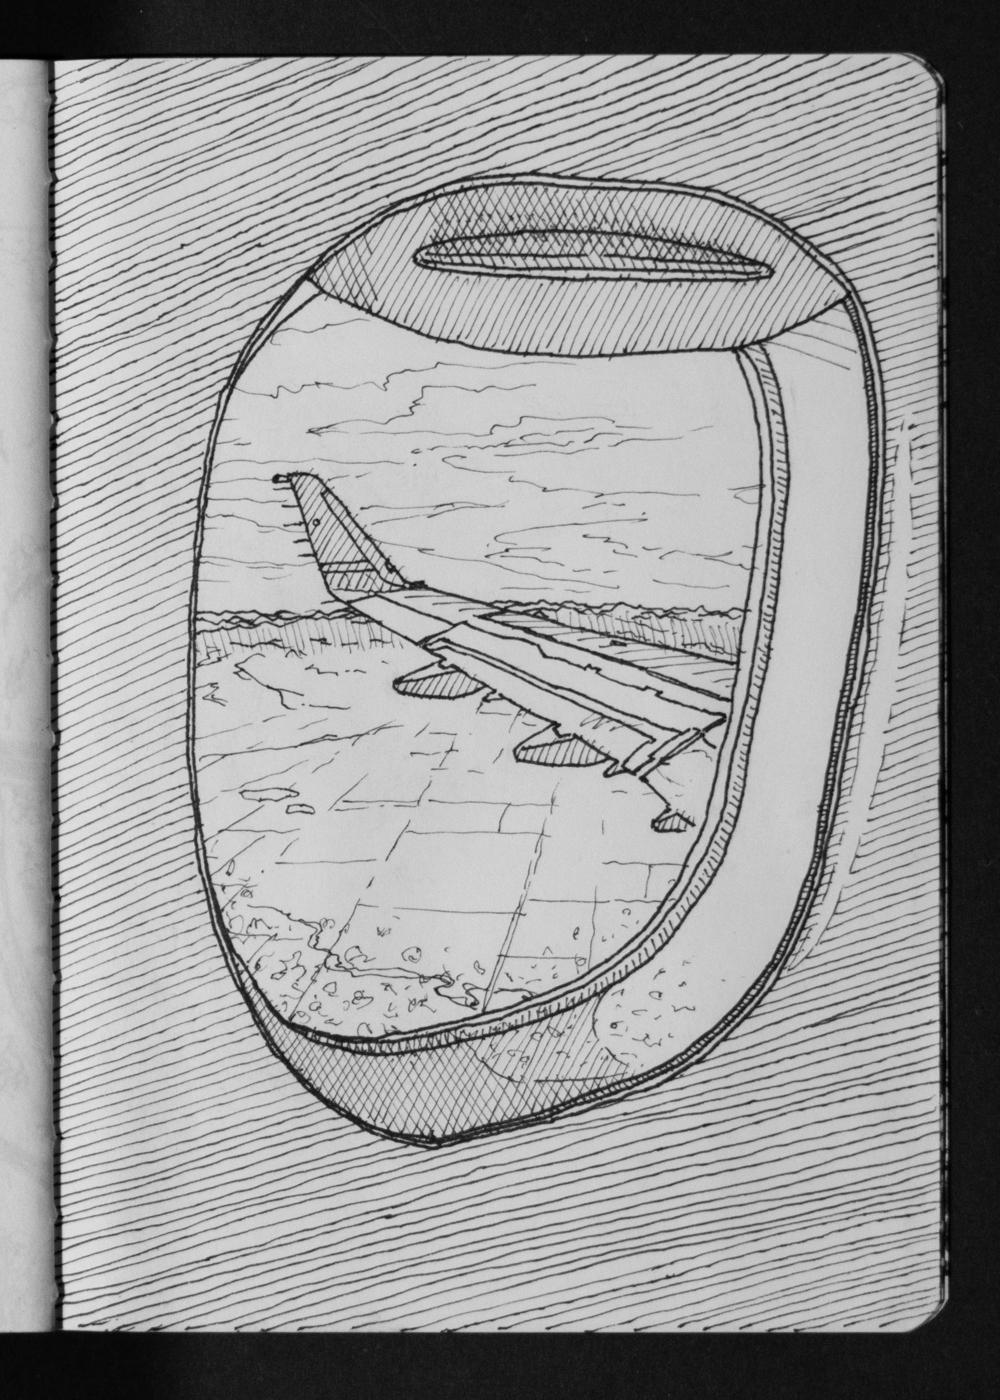 03-21 Flying to Calgary.jpg